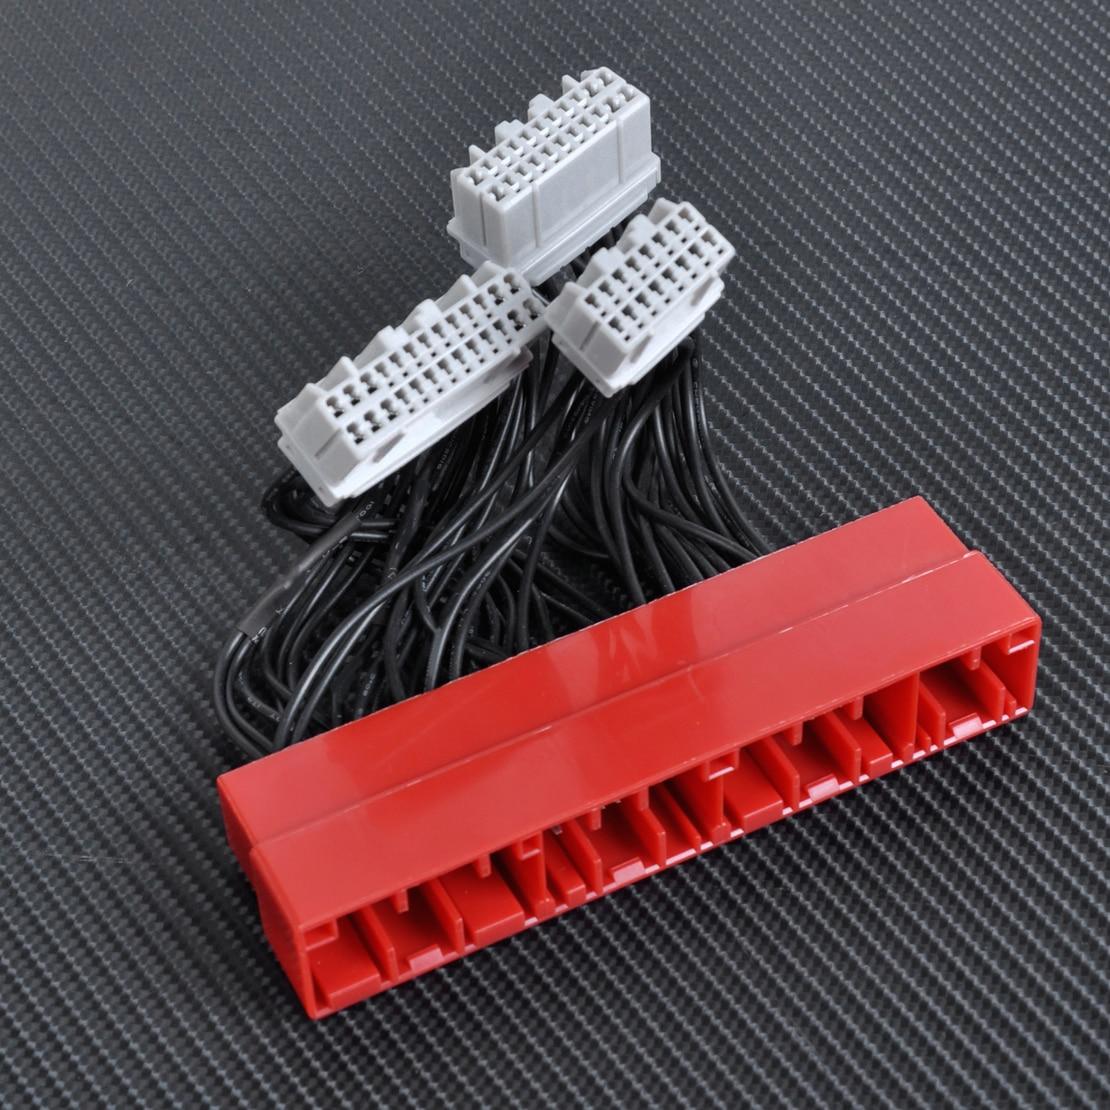 OBD2B TO OBD1 Conversion ECU Harness Jumper Adapter Wire Manual Transmission for Honda Civic 1999 2000 Acura Integra 2000